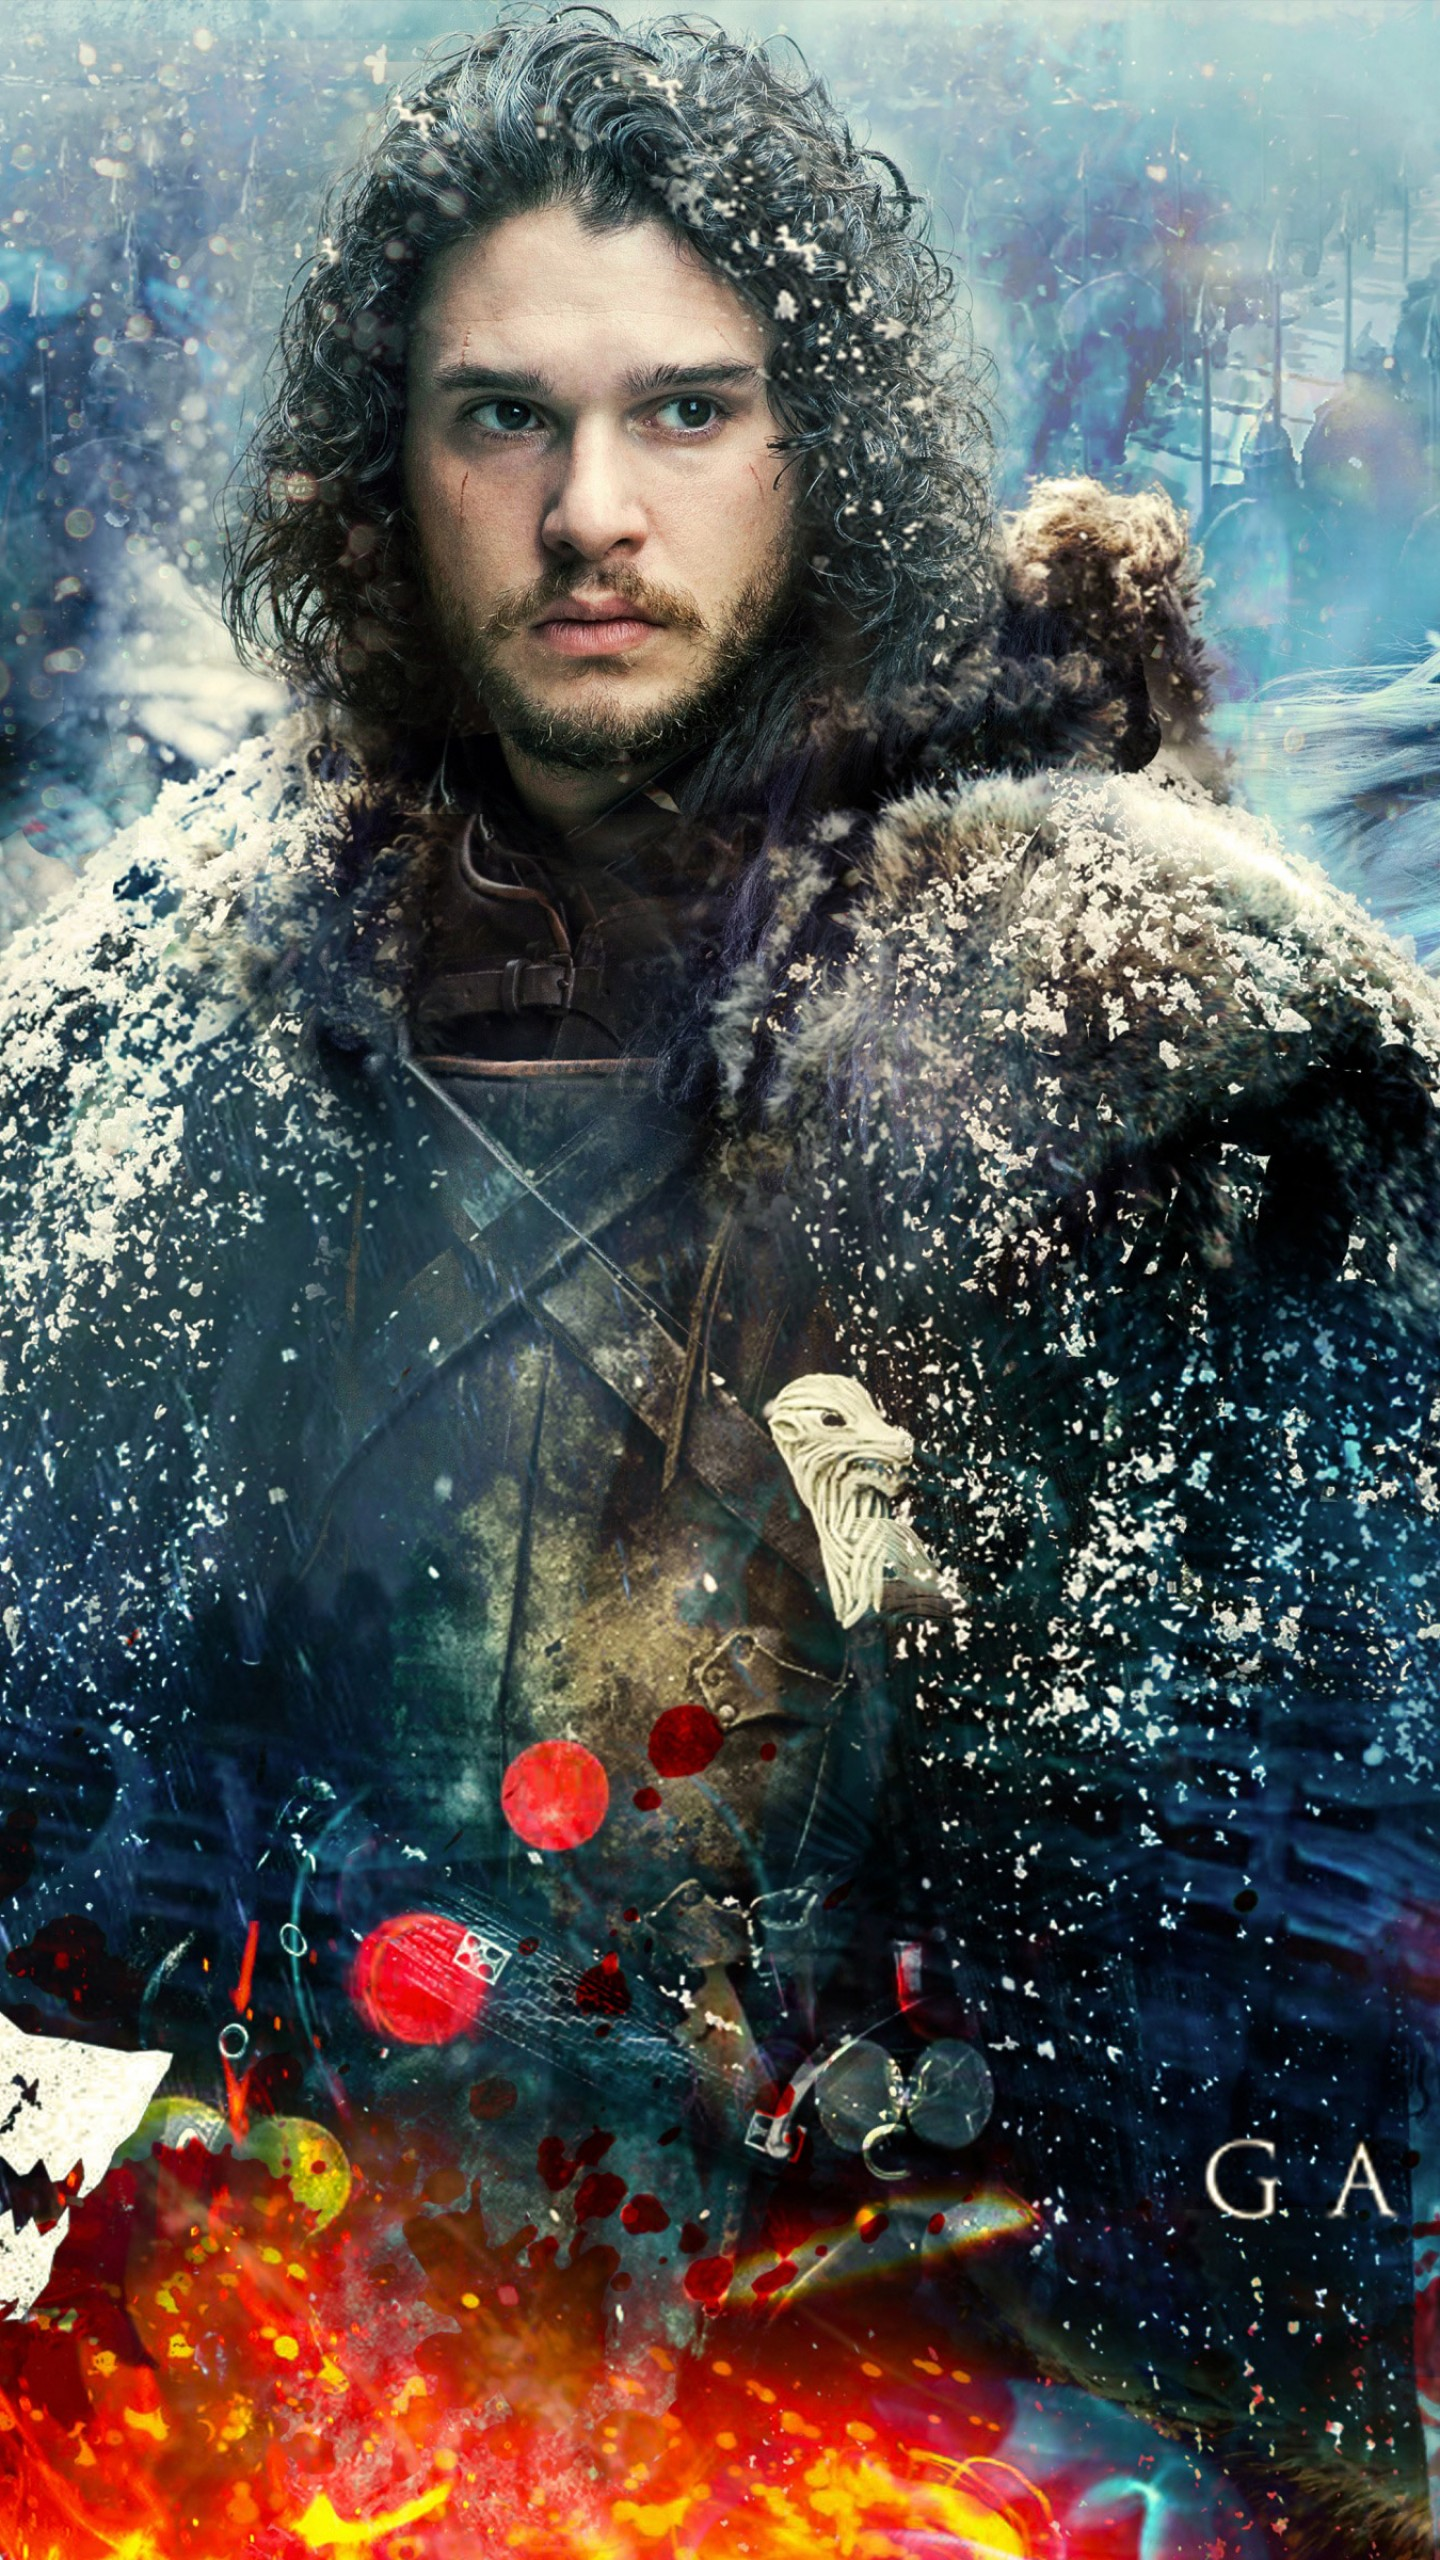 Wallpaper Game Of Thrones Season 7 Jon Snow Daenerys Targaryen